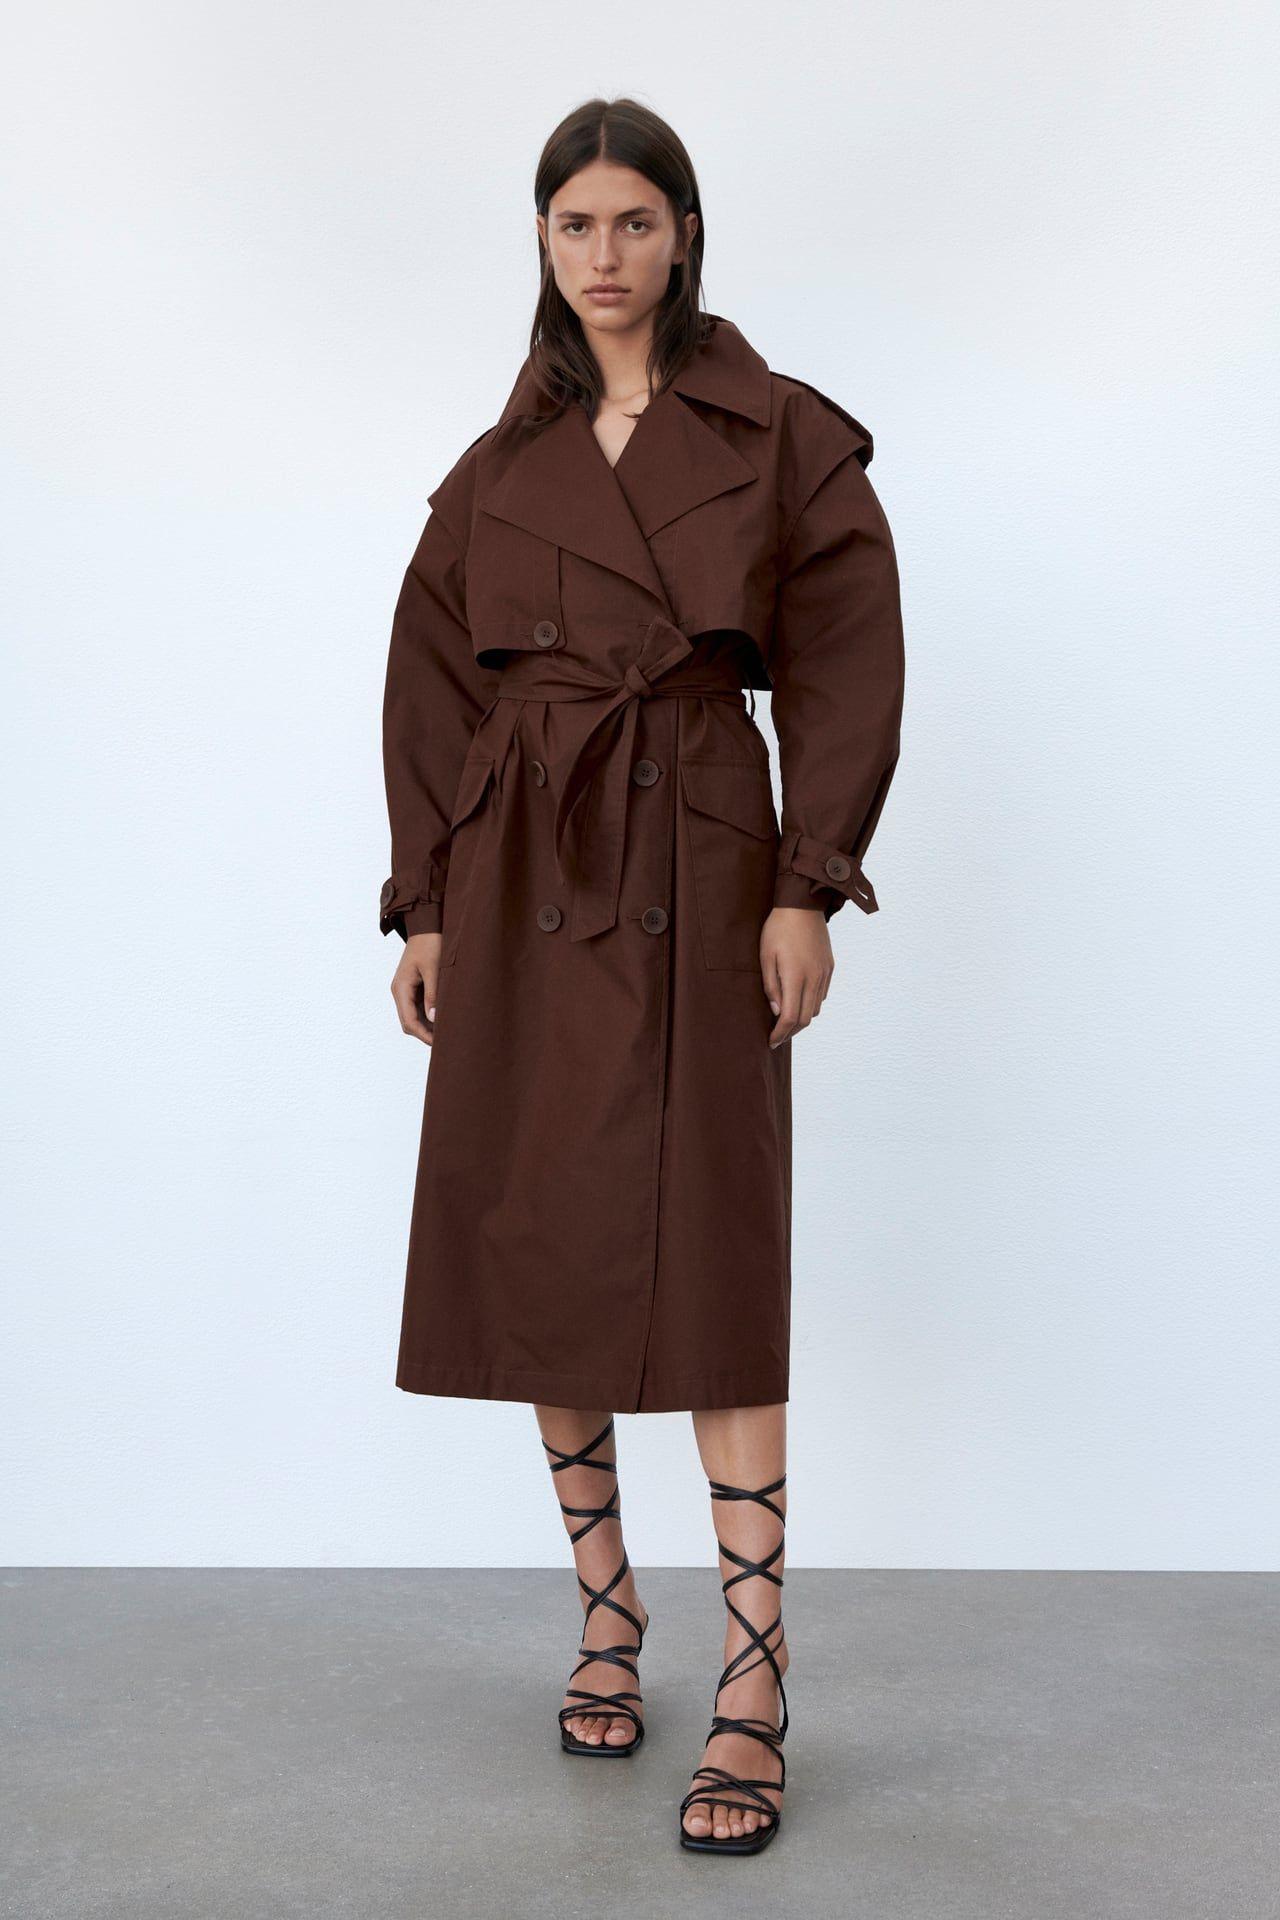 best new fashion items 286246 1629962418611